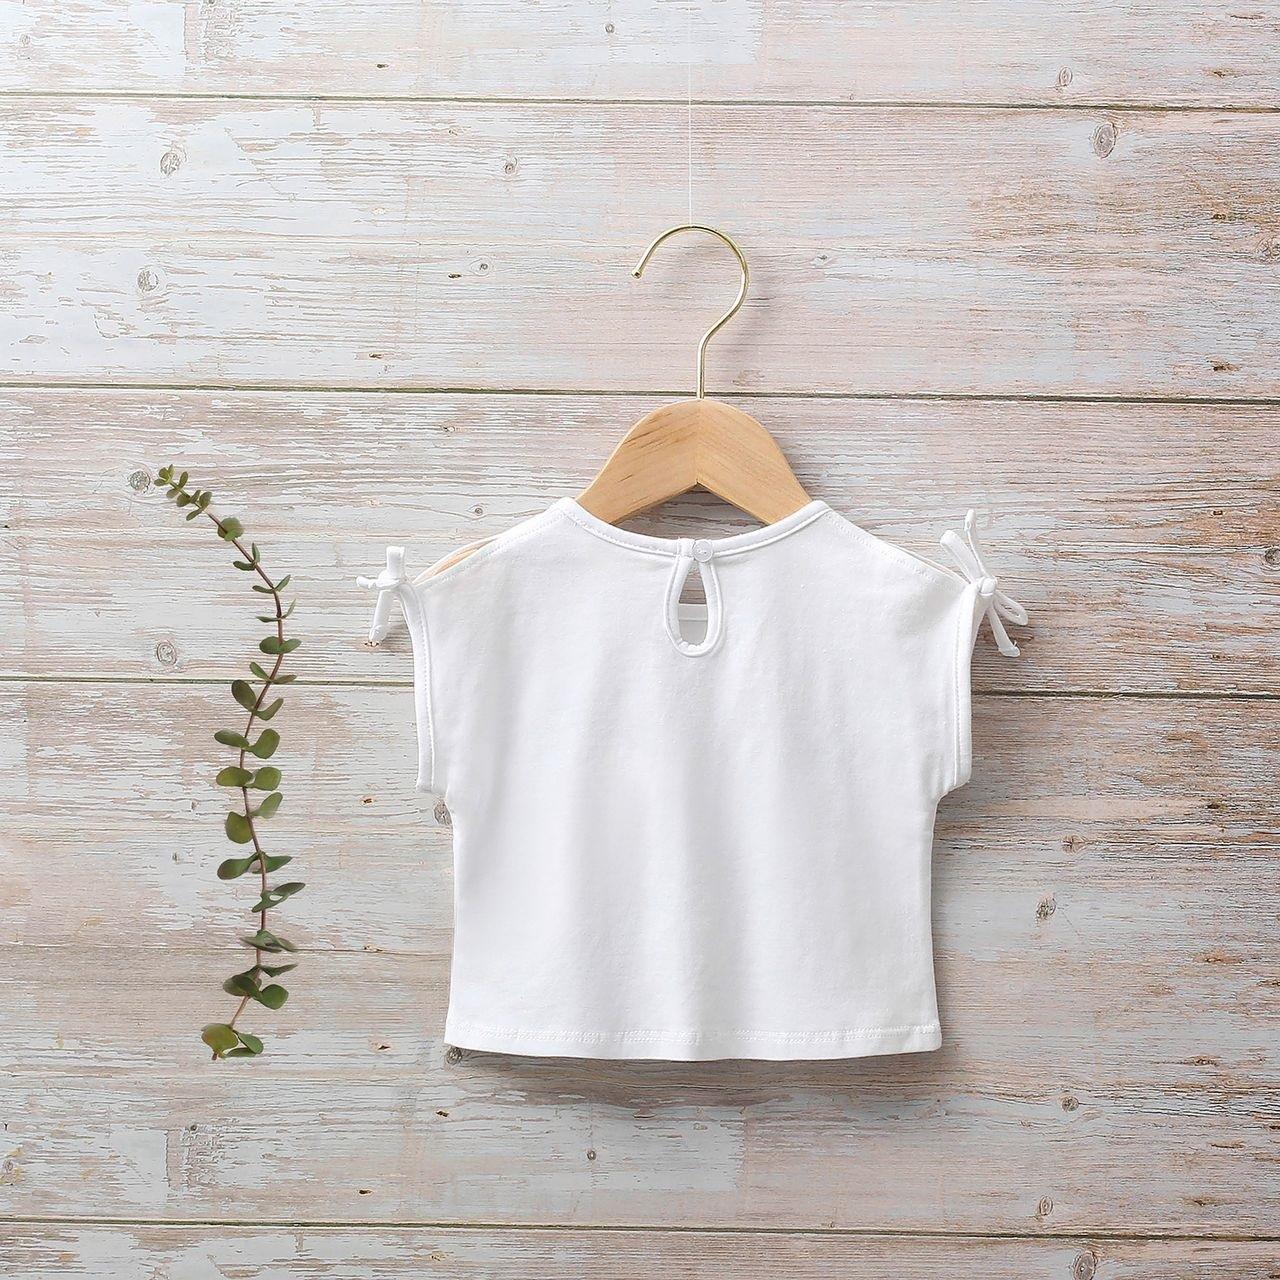 Imagen de Camiseta blanca niña con estampado de chica